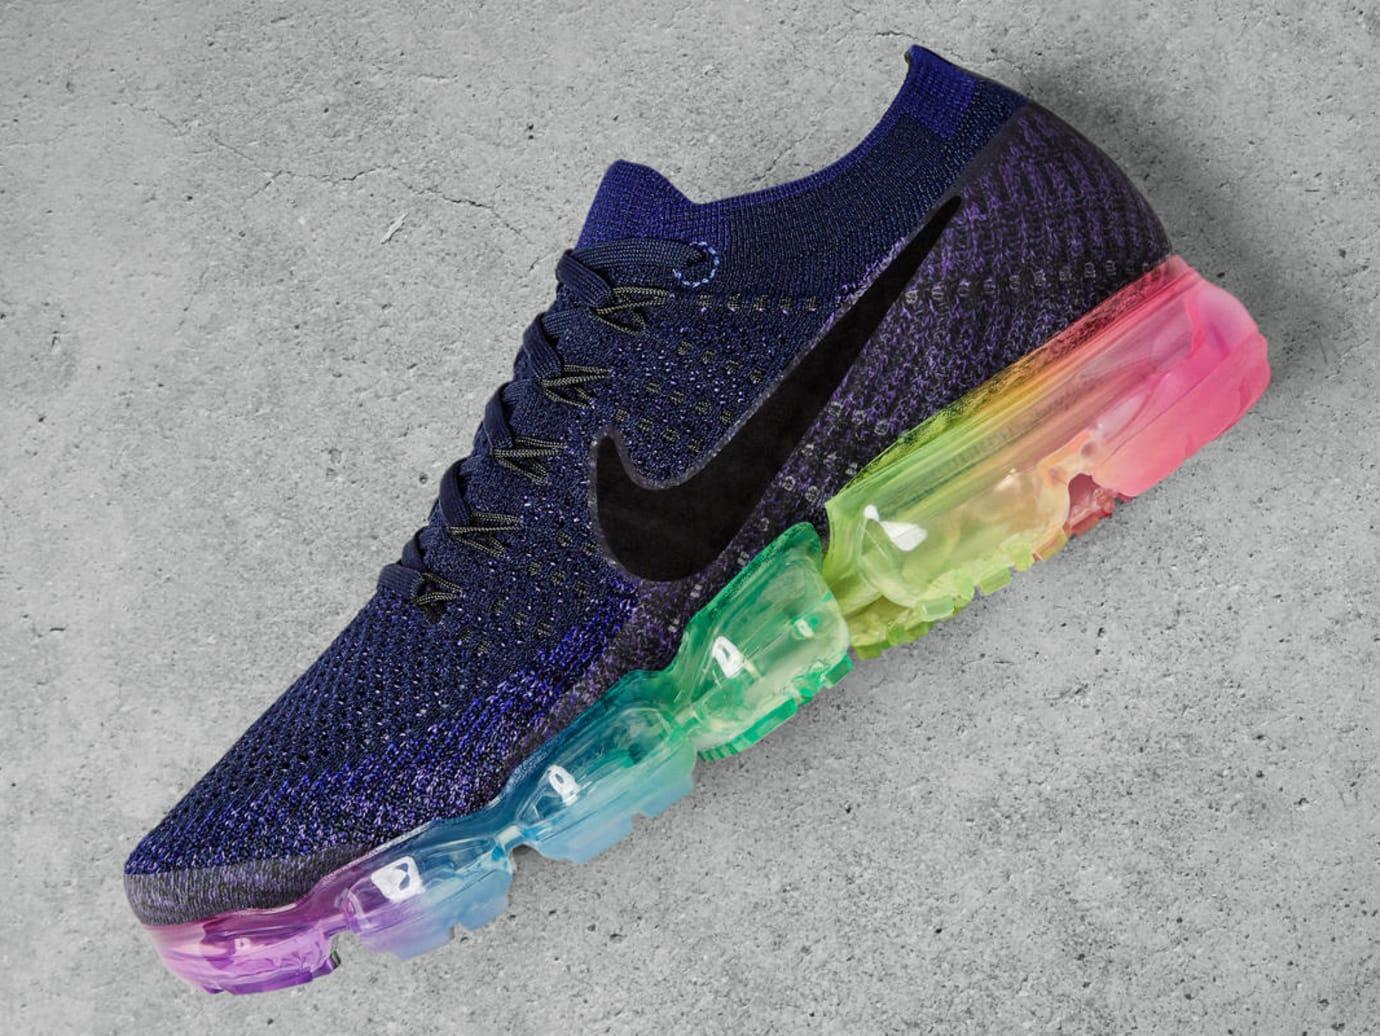 f3658a16d1f75 Image via Nike Nike Air VaporMax